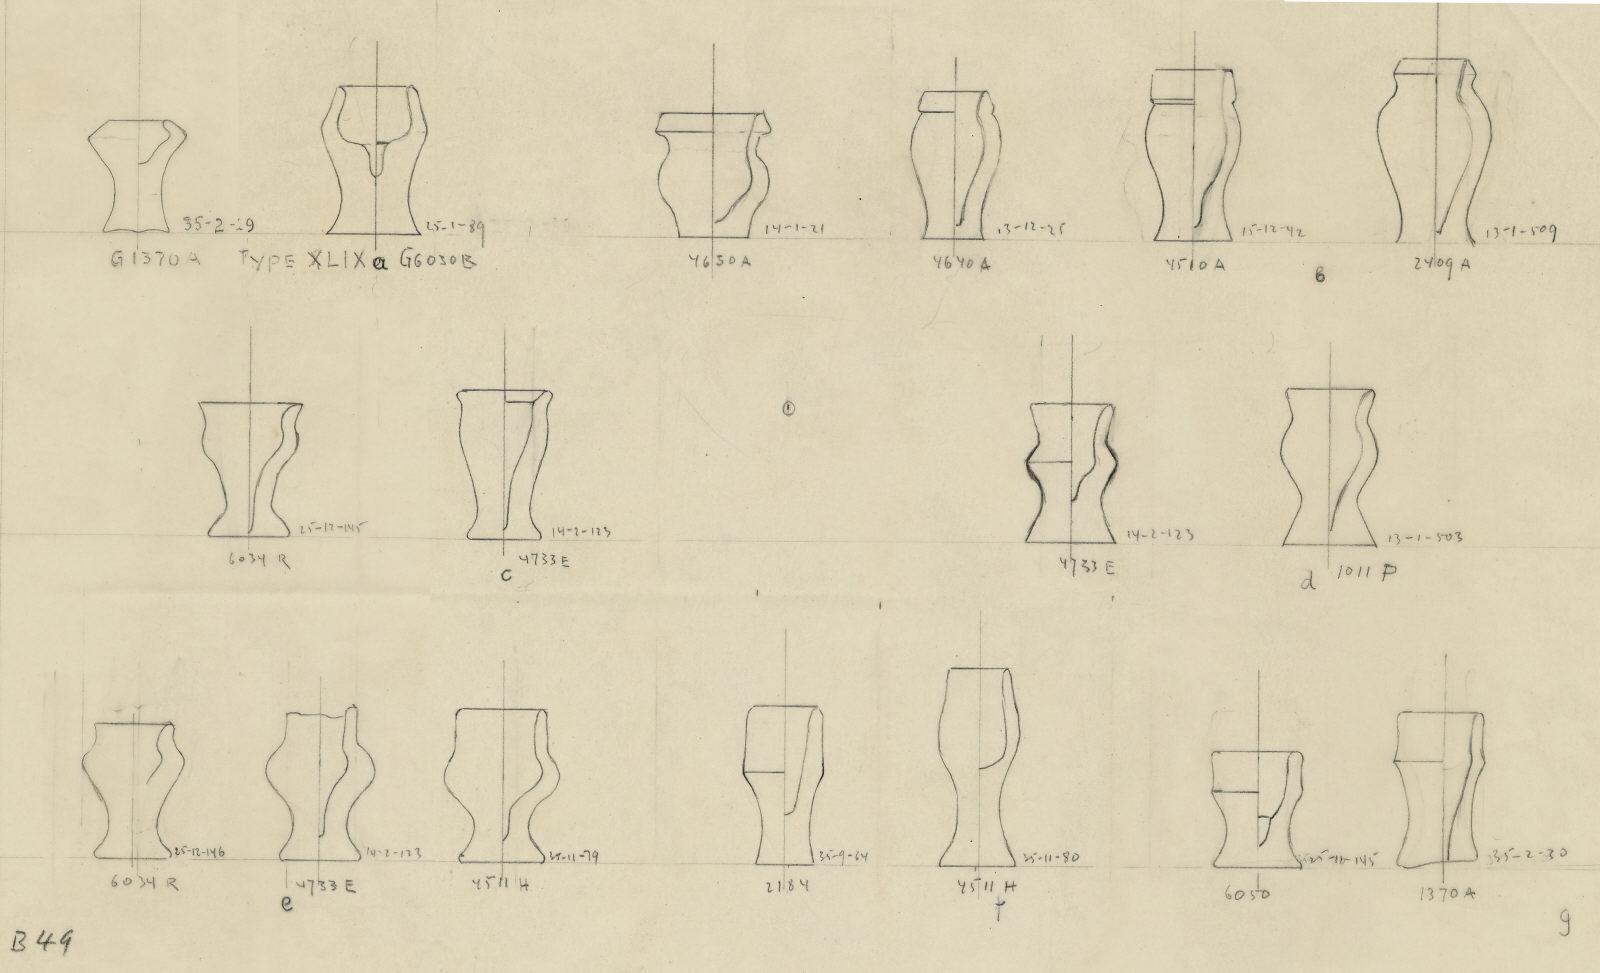 Drawings: Pottery model jars from G 1011, G 1370, G 2184, G 2409, G 4510, G 4511, G 4630, G 4640, G 4733, G 6030, G 6034, G 6050